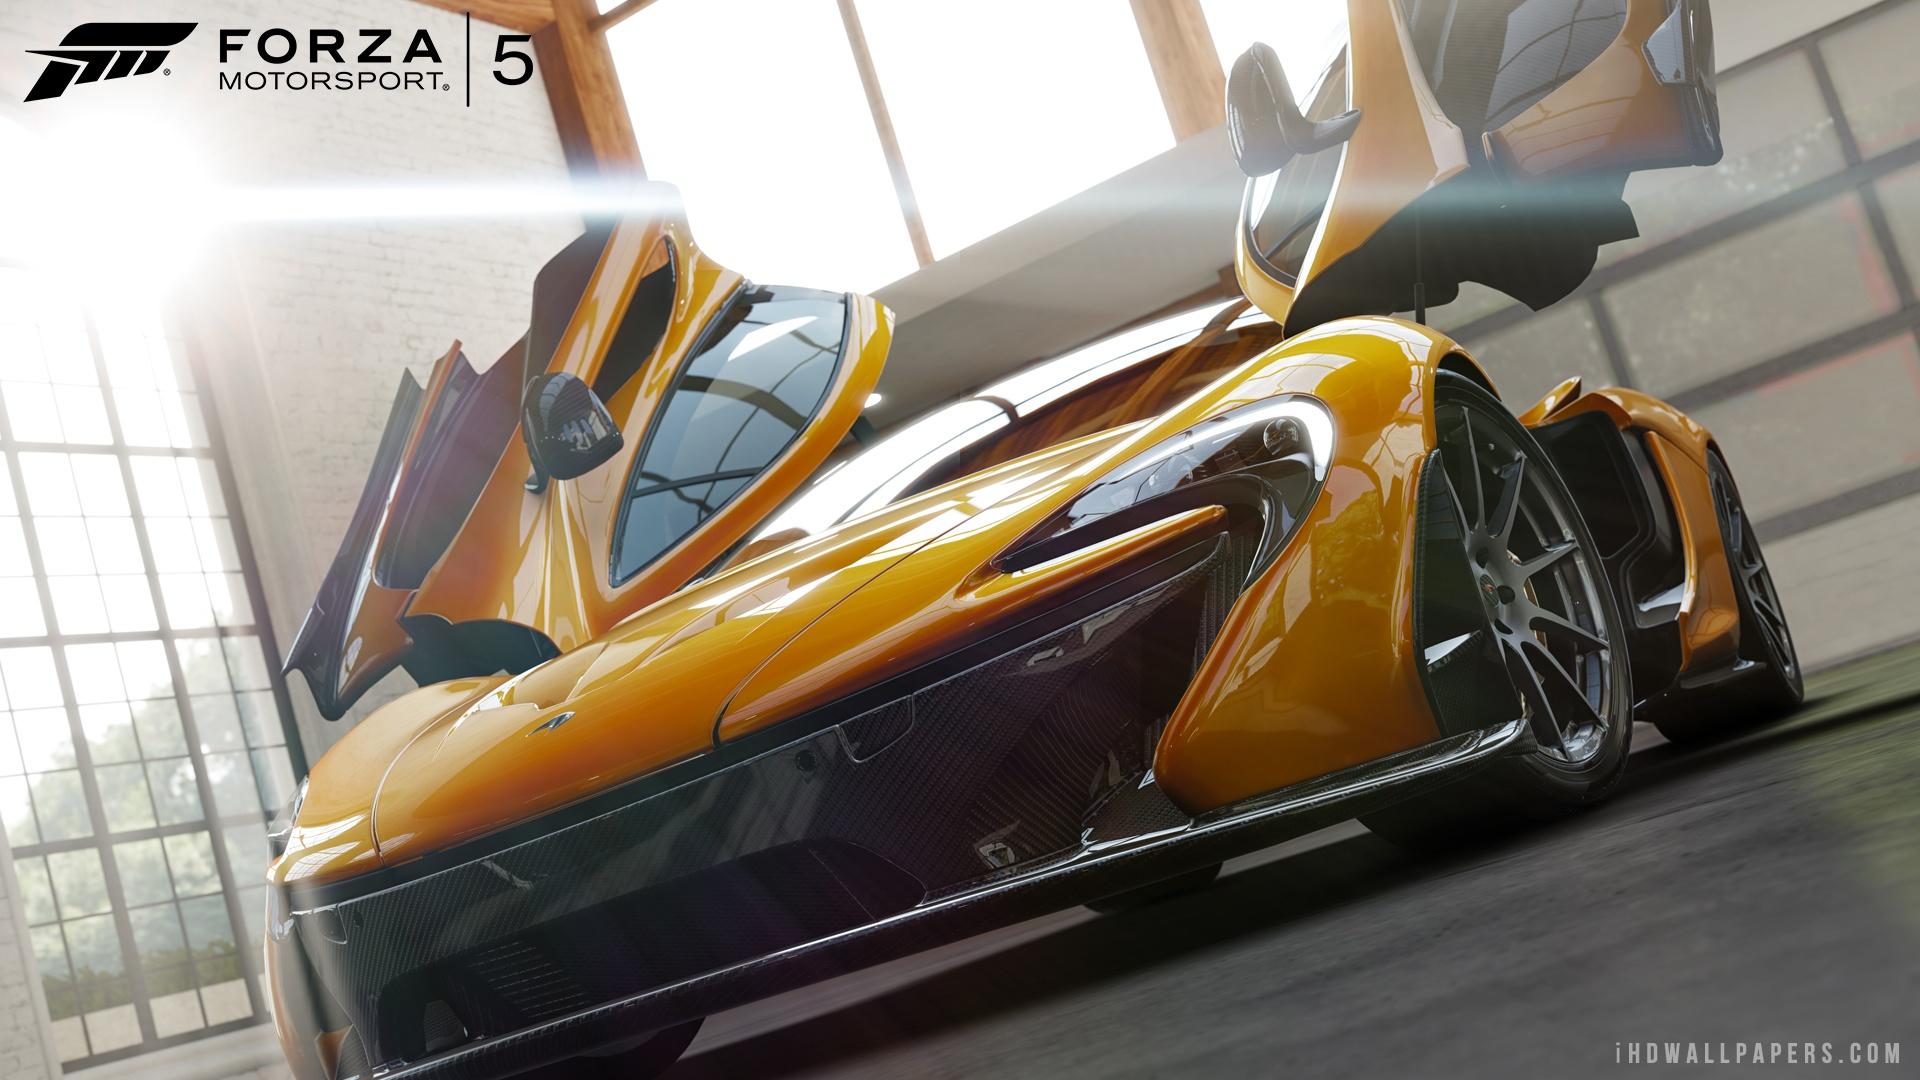 Forza 5 McLaren P1 HD Wallpaper   iHD Wallpapers 1920x1080